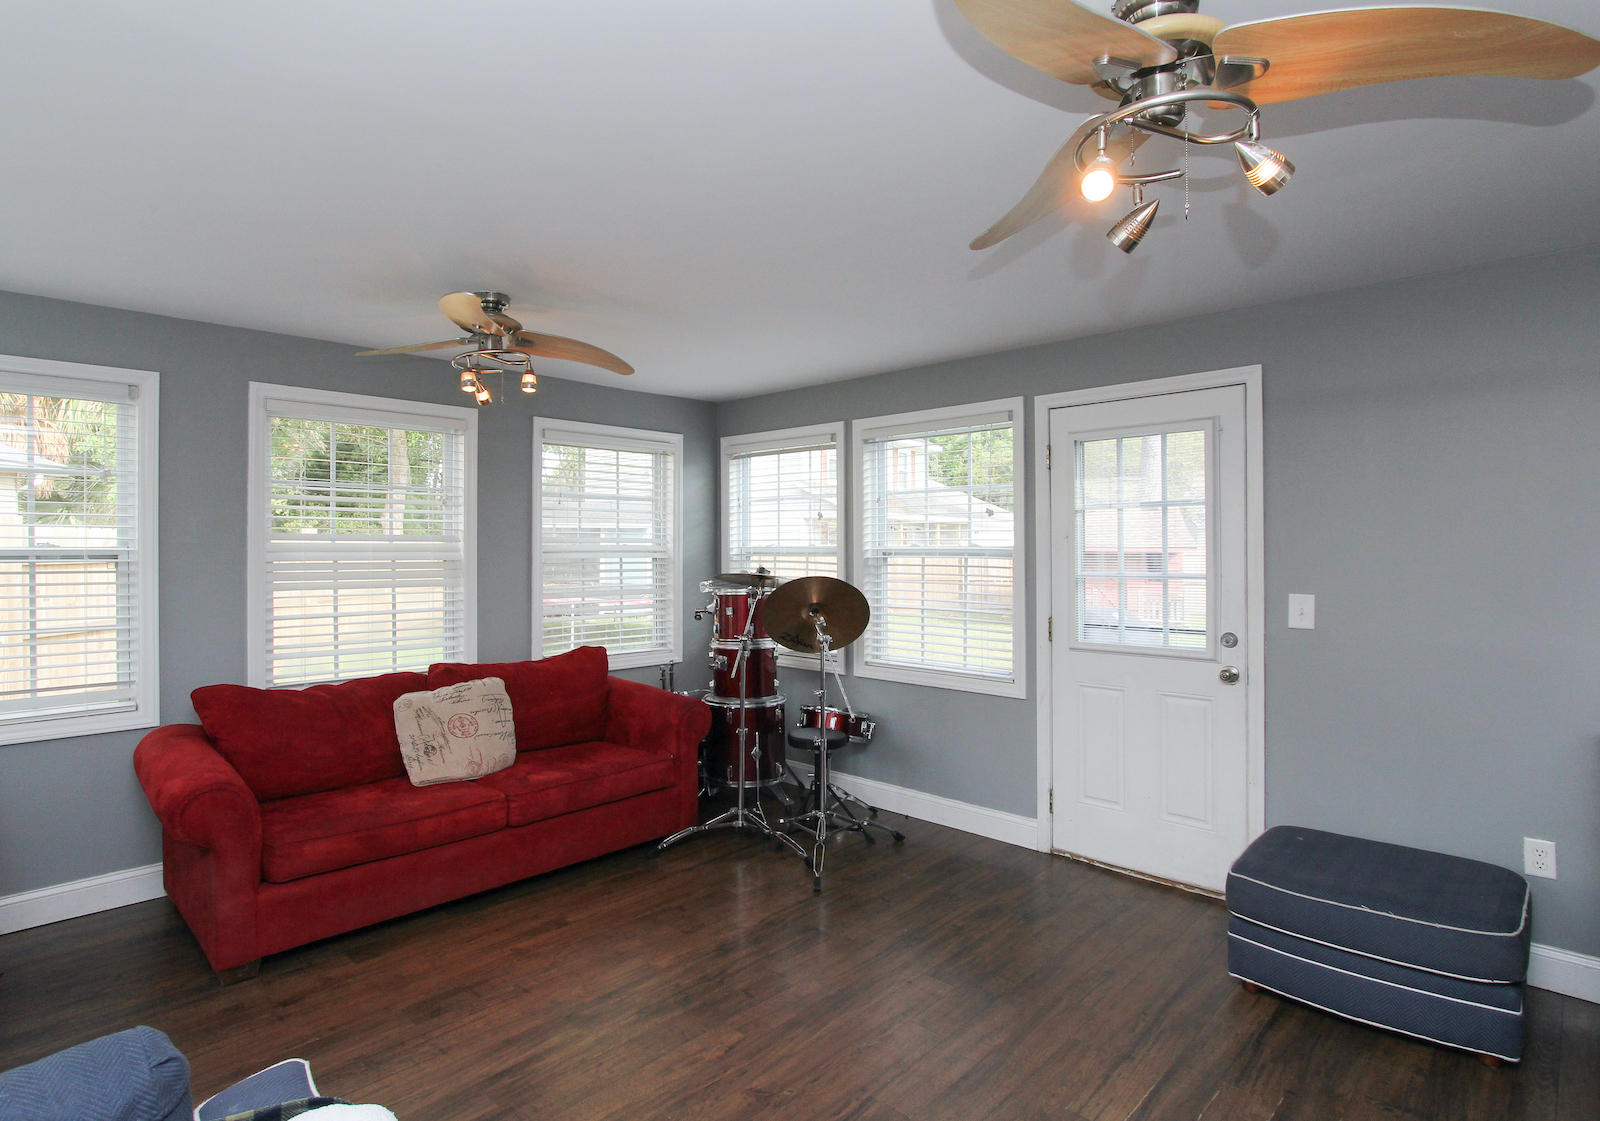 Landings Run Homes For Sale - 1548 Wickfield, Mount Pleasant, SC - 13